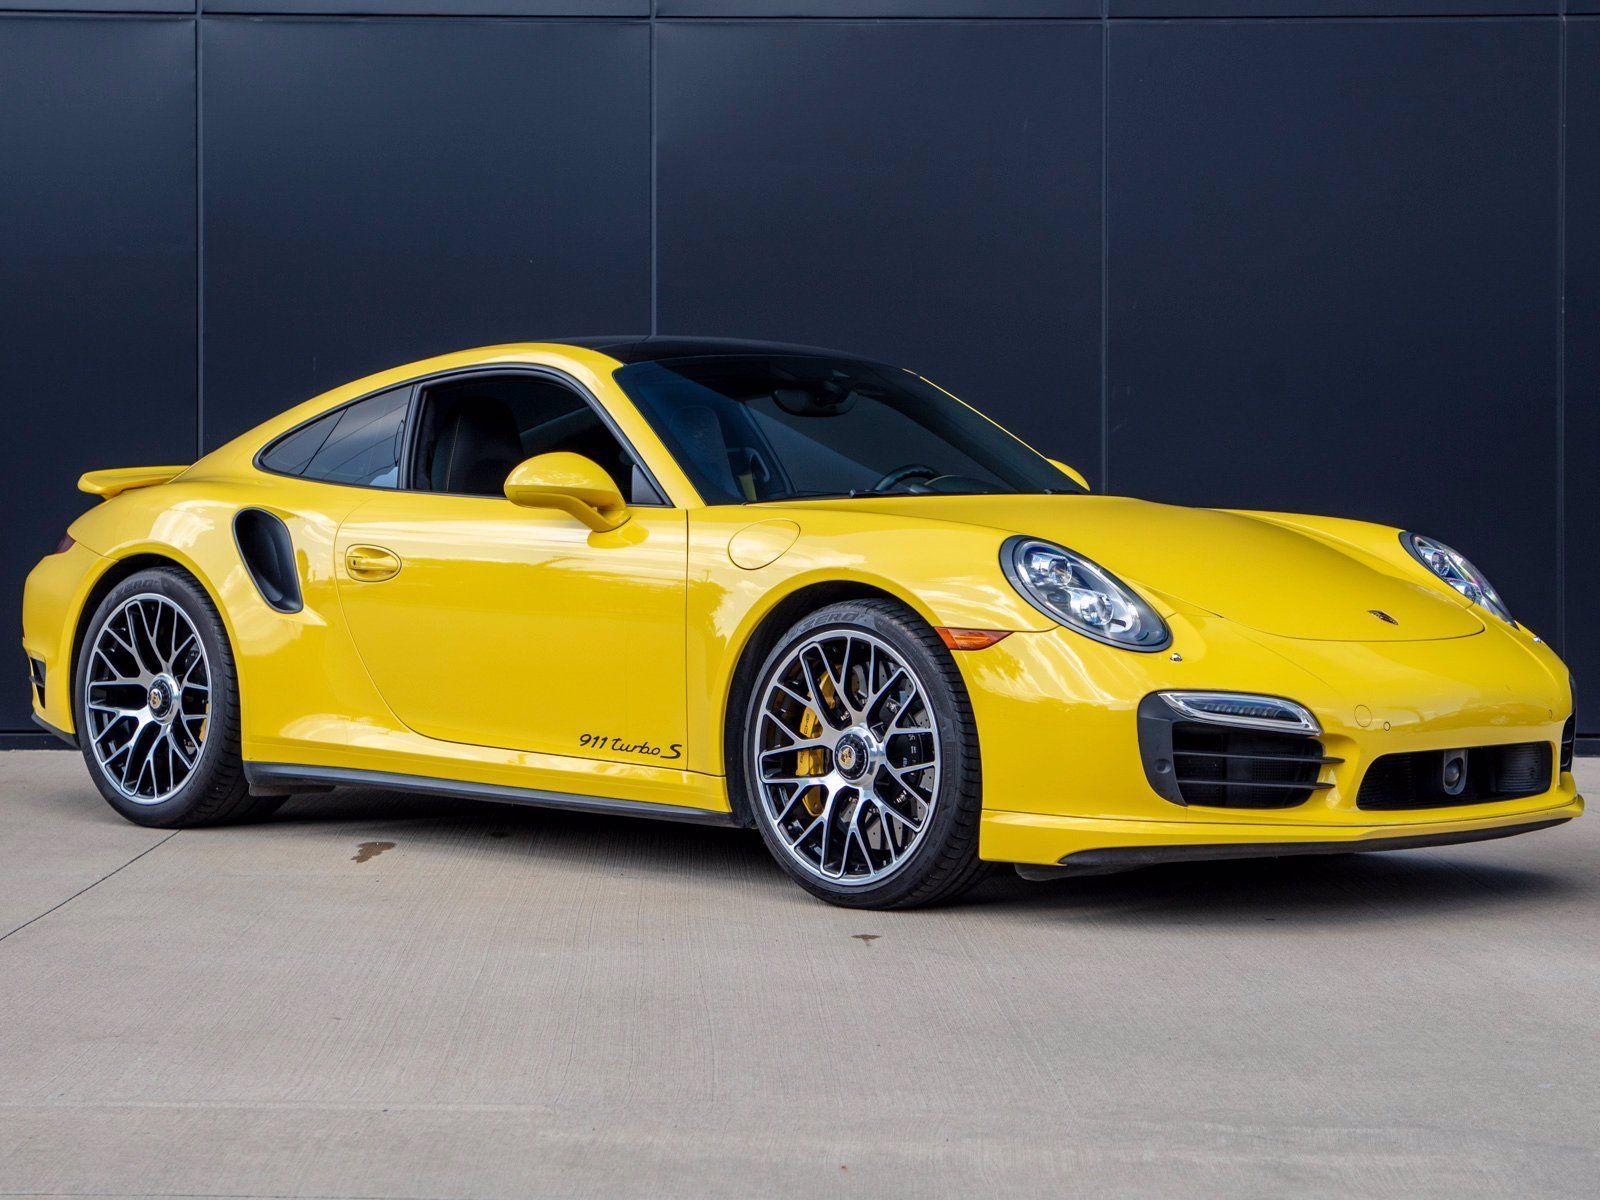 2014 Porsche 911 Turbo S – 1